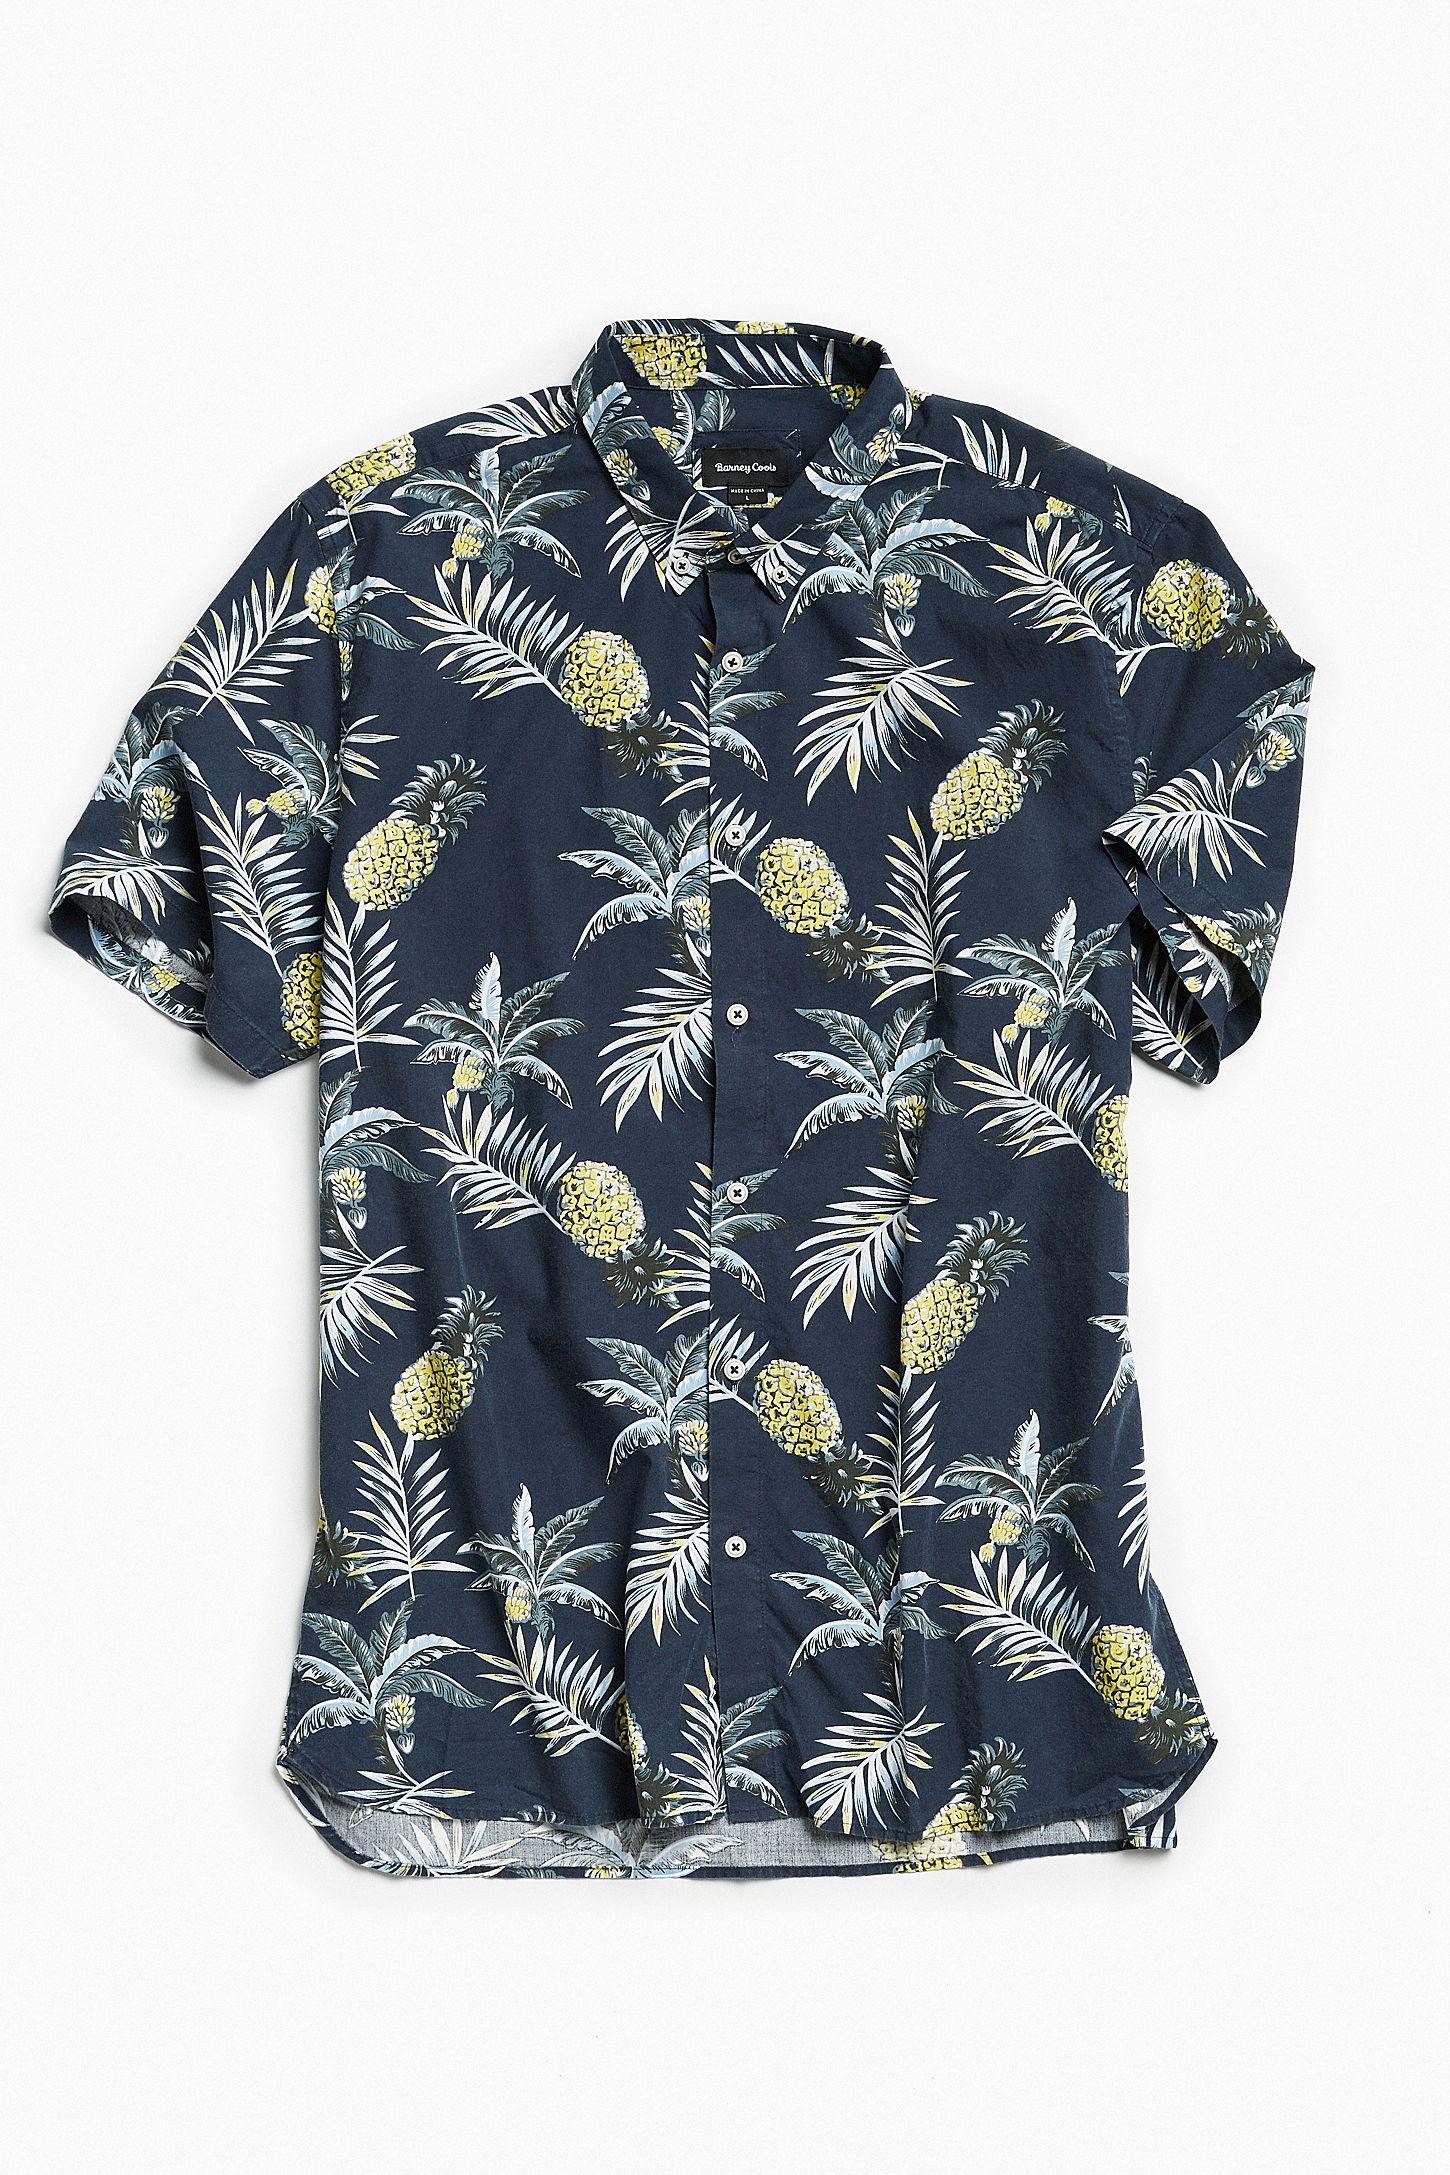 b0bb4c22c8 Barney Cools Black Floral Short Sleeve Button-Down Shirt